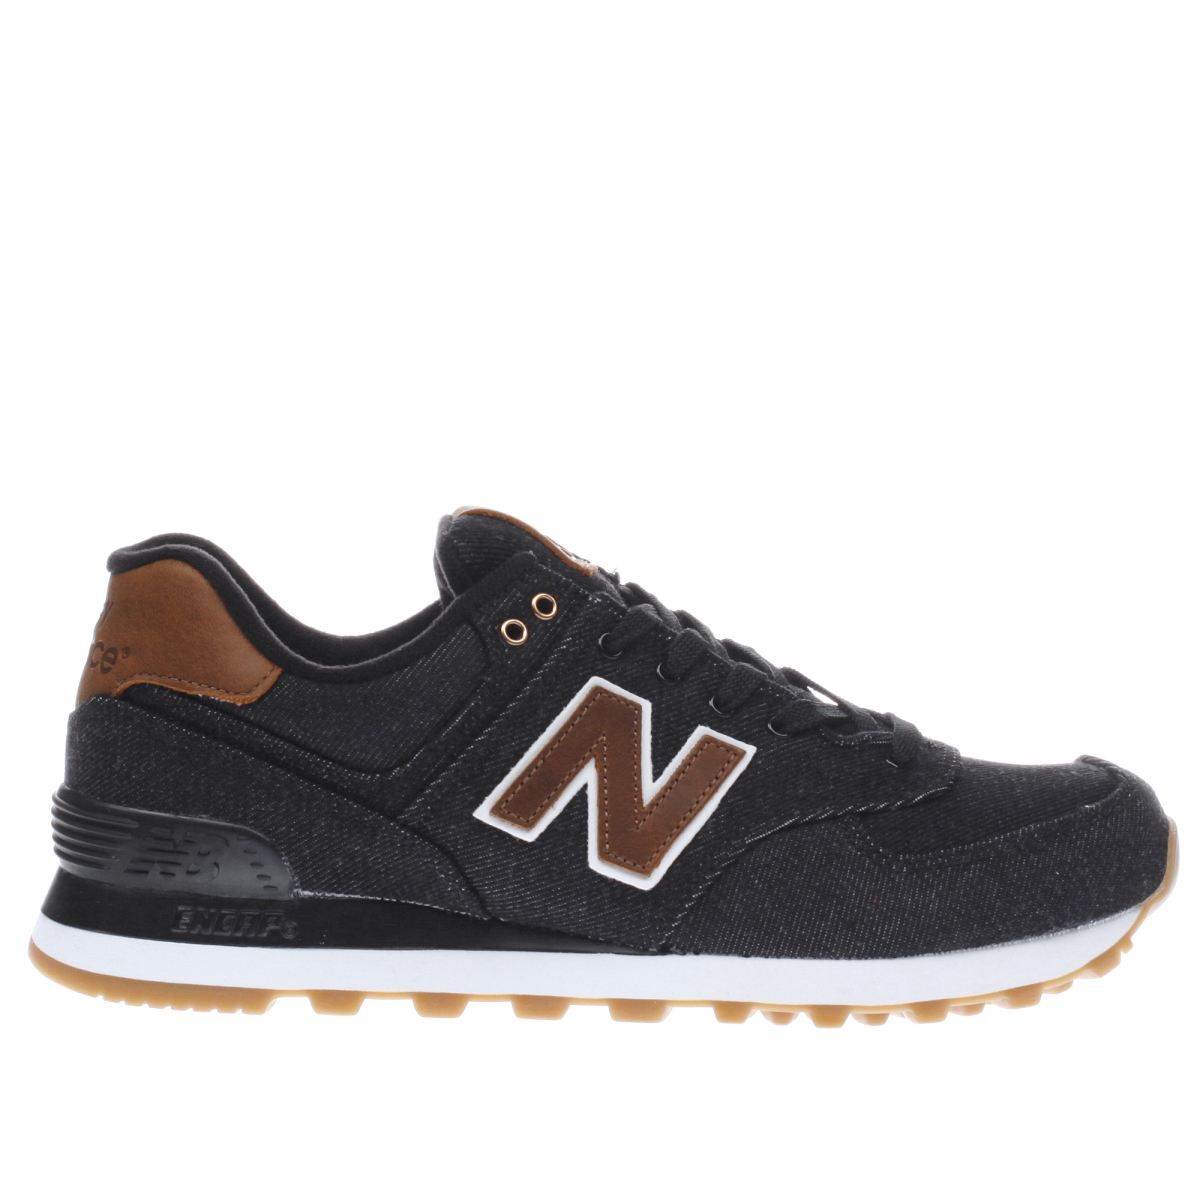 new balance black & brown 574 trainers